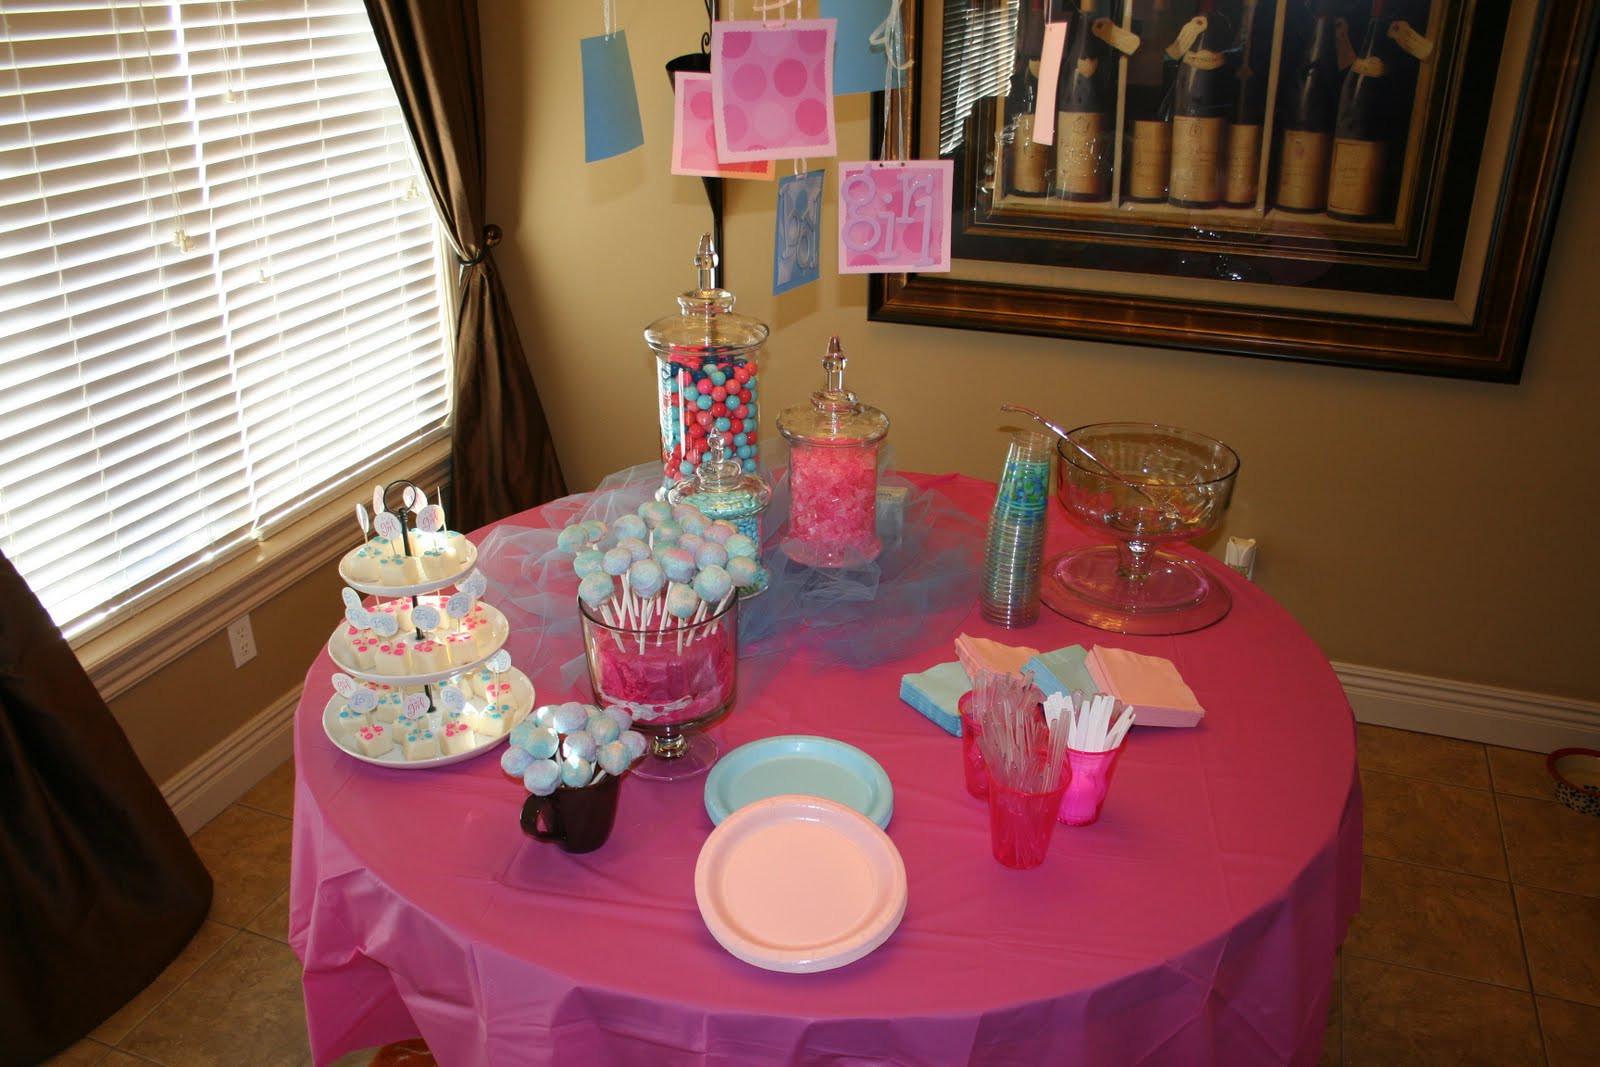 Reveal Baby Gender Party Ideas  DIY Baby Gender Reveal Party Sendo Invitations